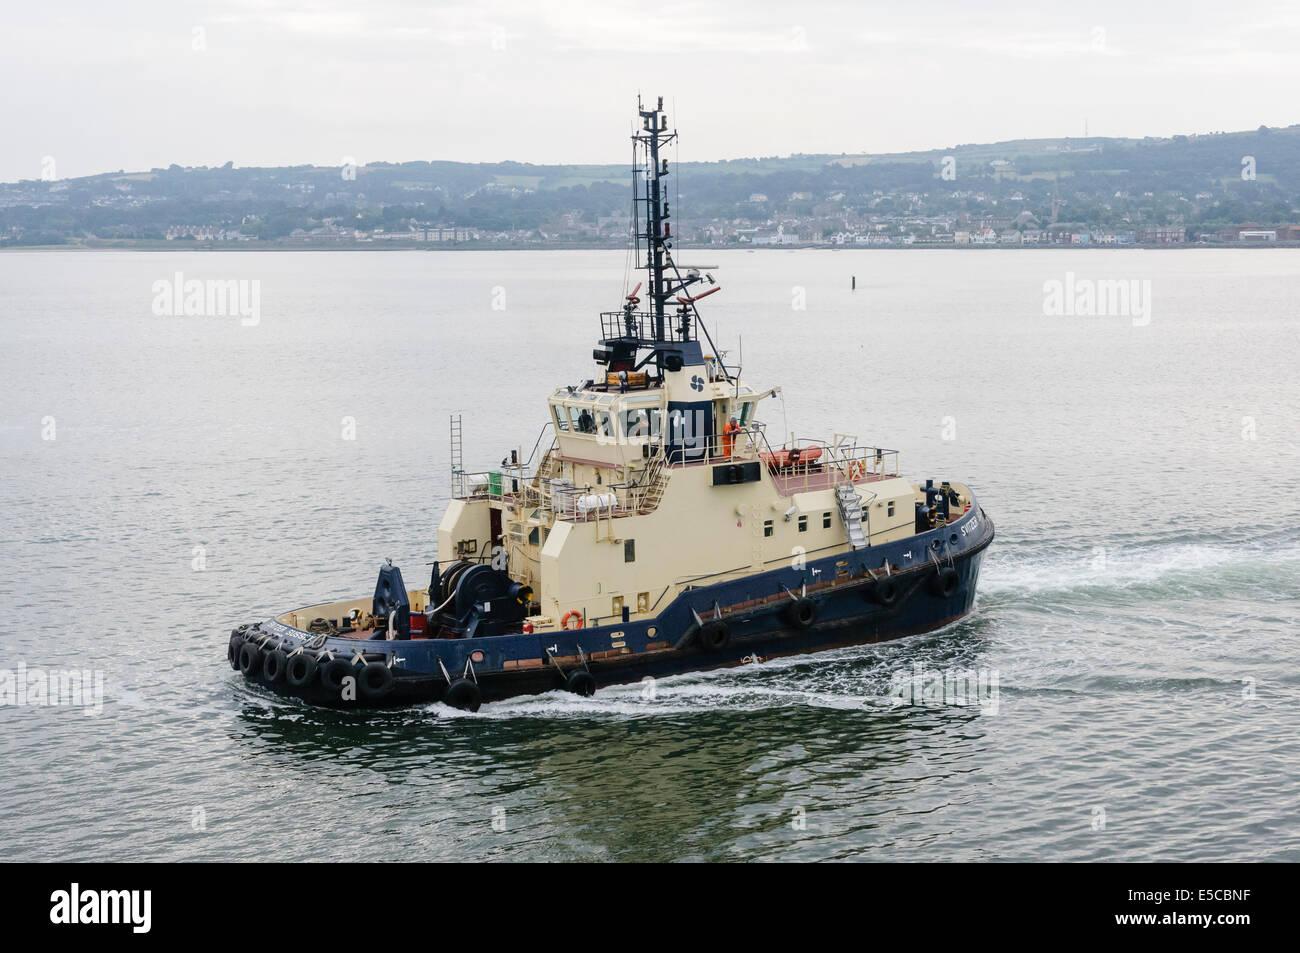 Belfast, Northern Ireland. 26/07/2014 - Tugboat 'Svitzer Sussex' in Belfast Lough. Credit:  Stephen Barnes/Alamy - Stock Image